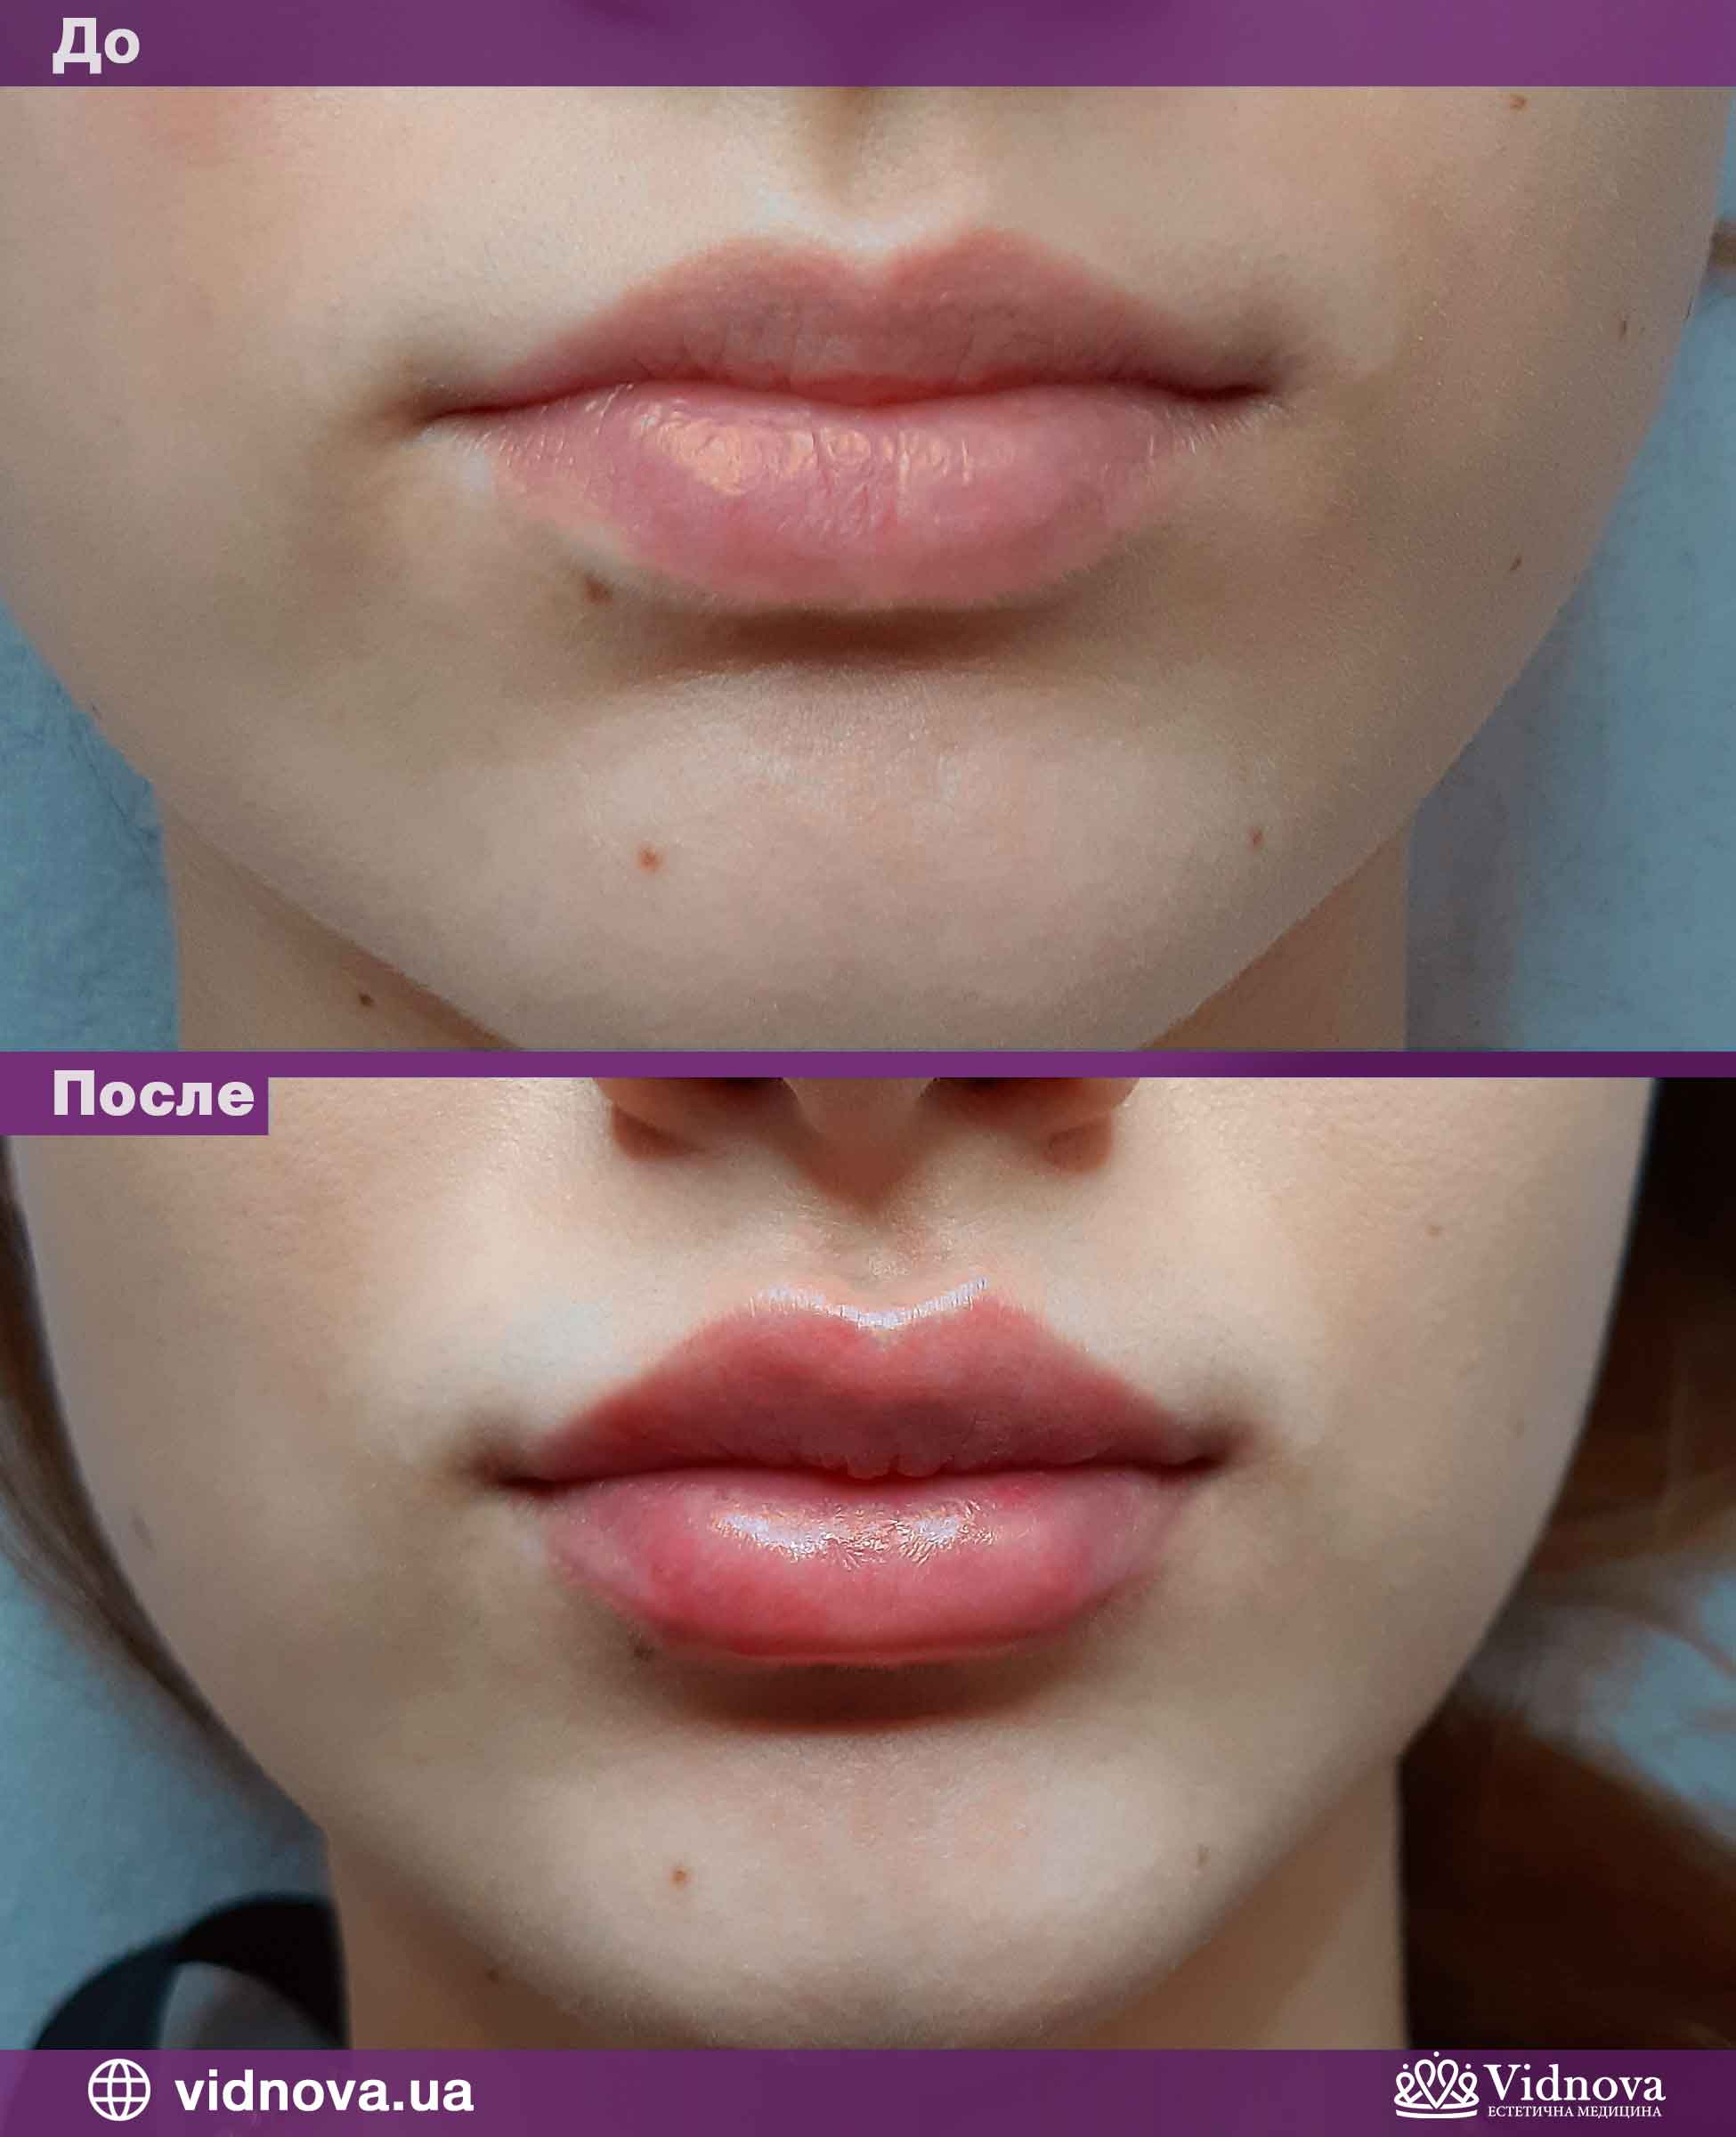 Увеличение губ: Фото До и После - Пример №7-1 - Клиника Vidnova